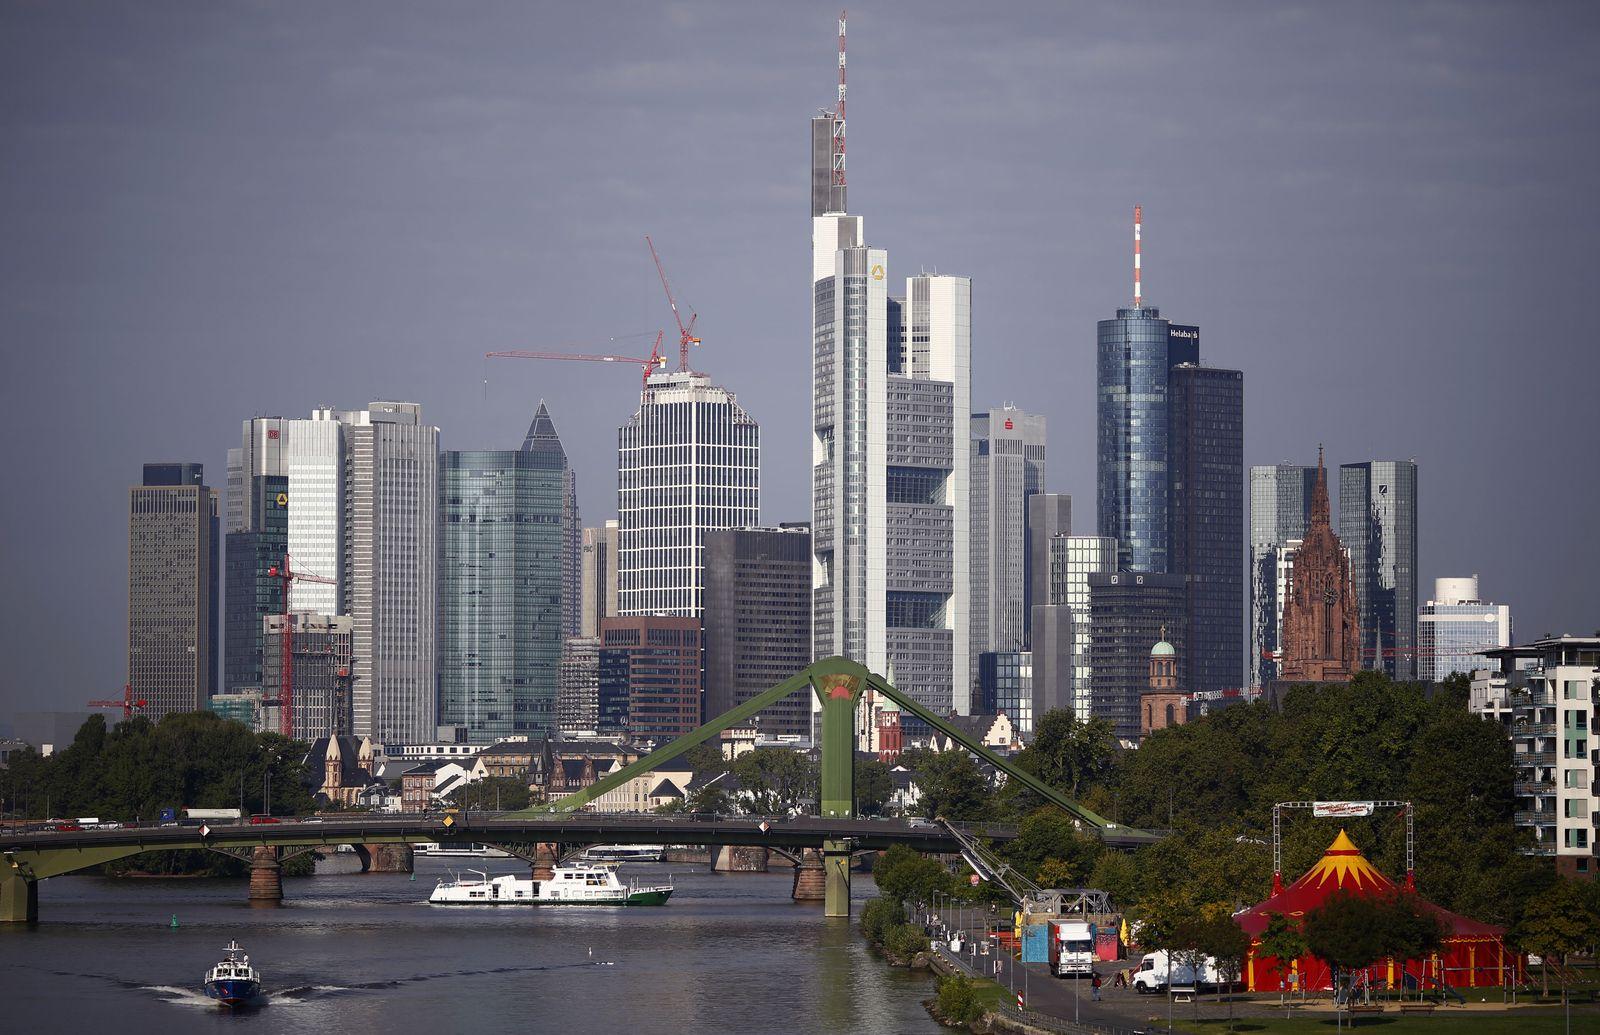 Skyline / Frankfurt / Banken